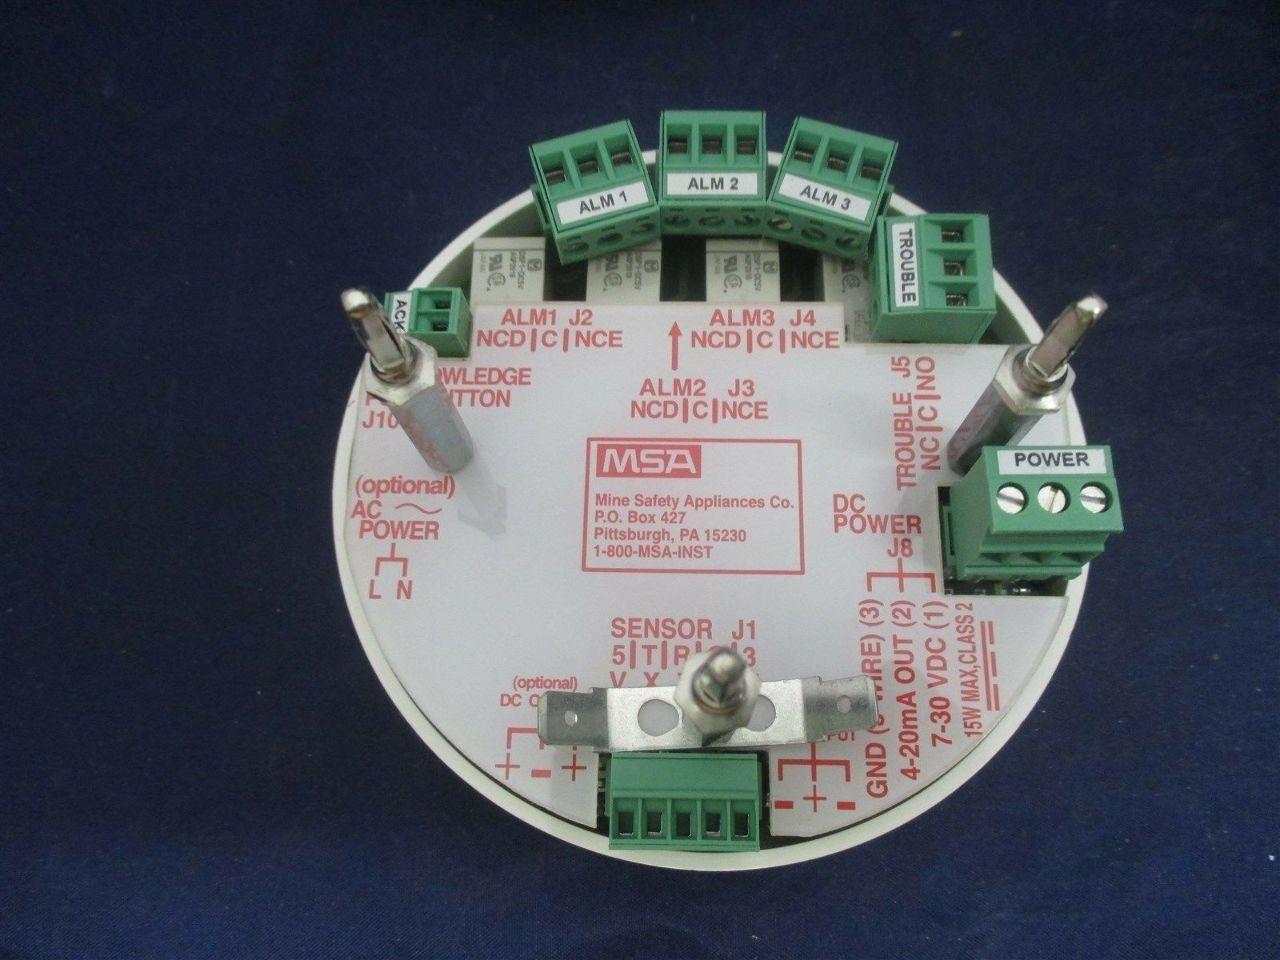 Msa Ultima Xe W Xir Sensor Gas Monitor New Process